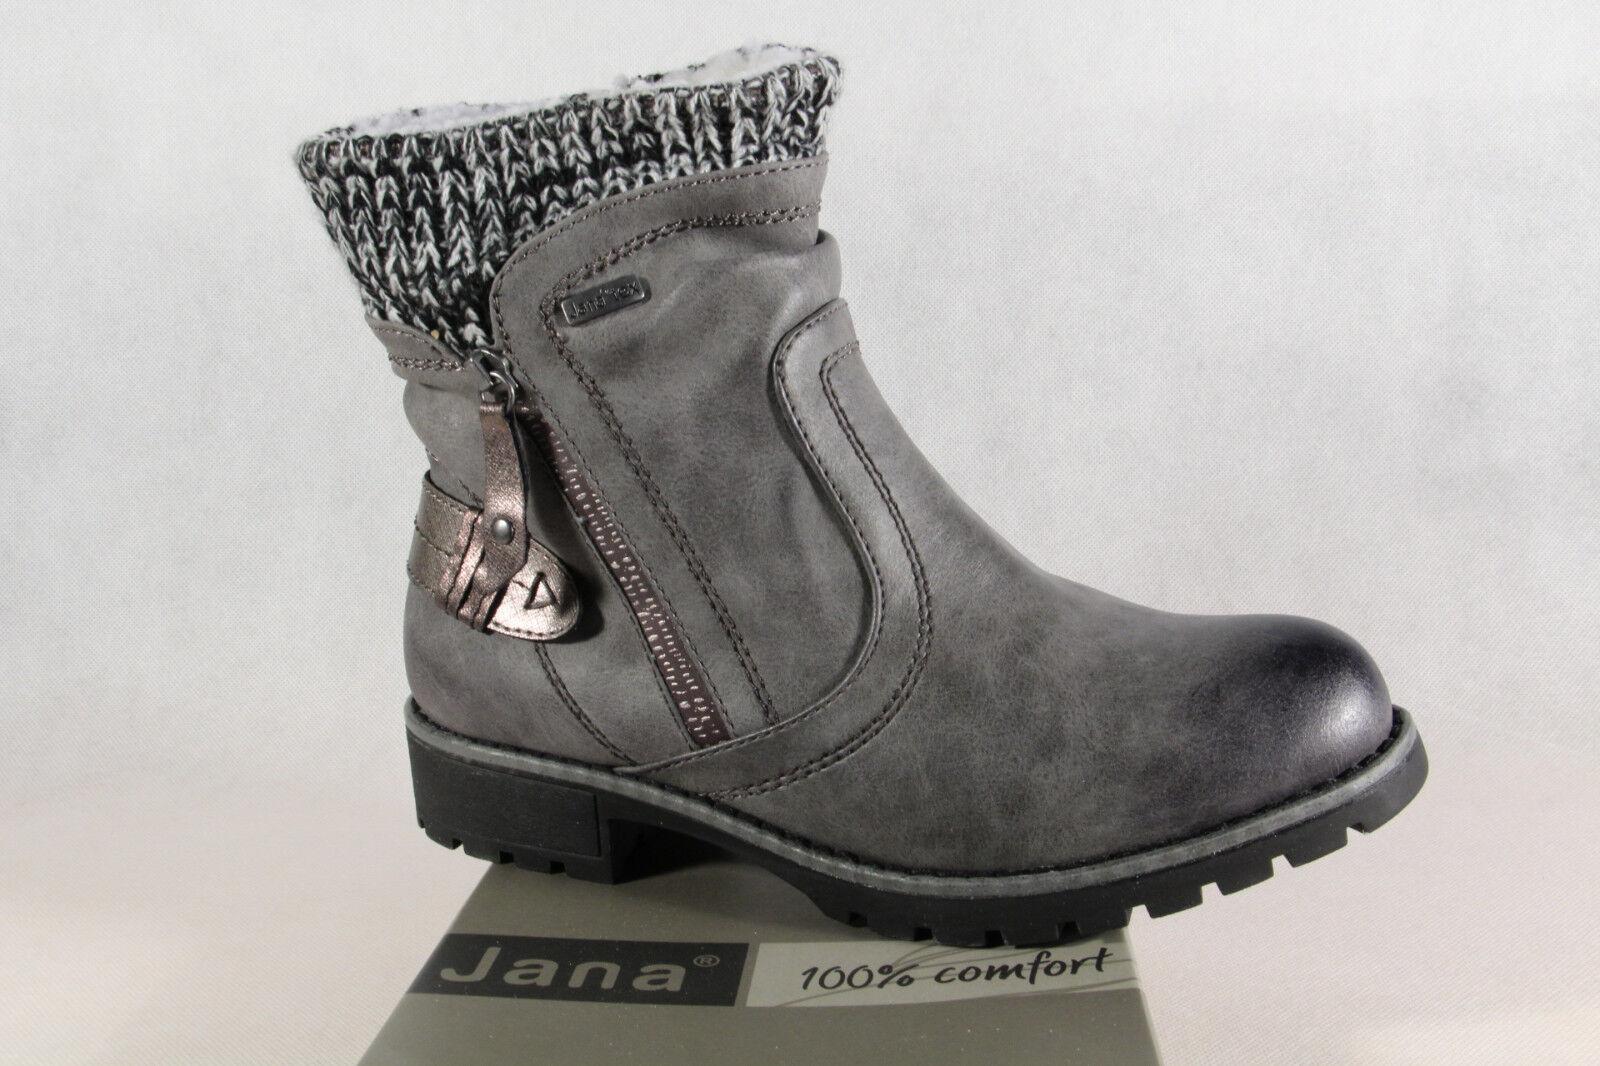 Jana Tex Winterstiefel Damen Stiefelette Stiefelette Damen Stiefel Stiefel ... 29816f